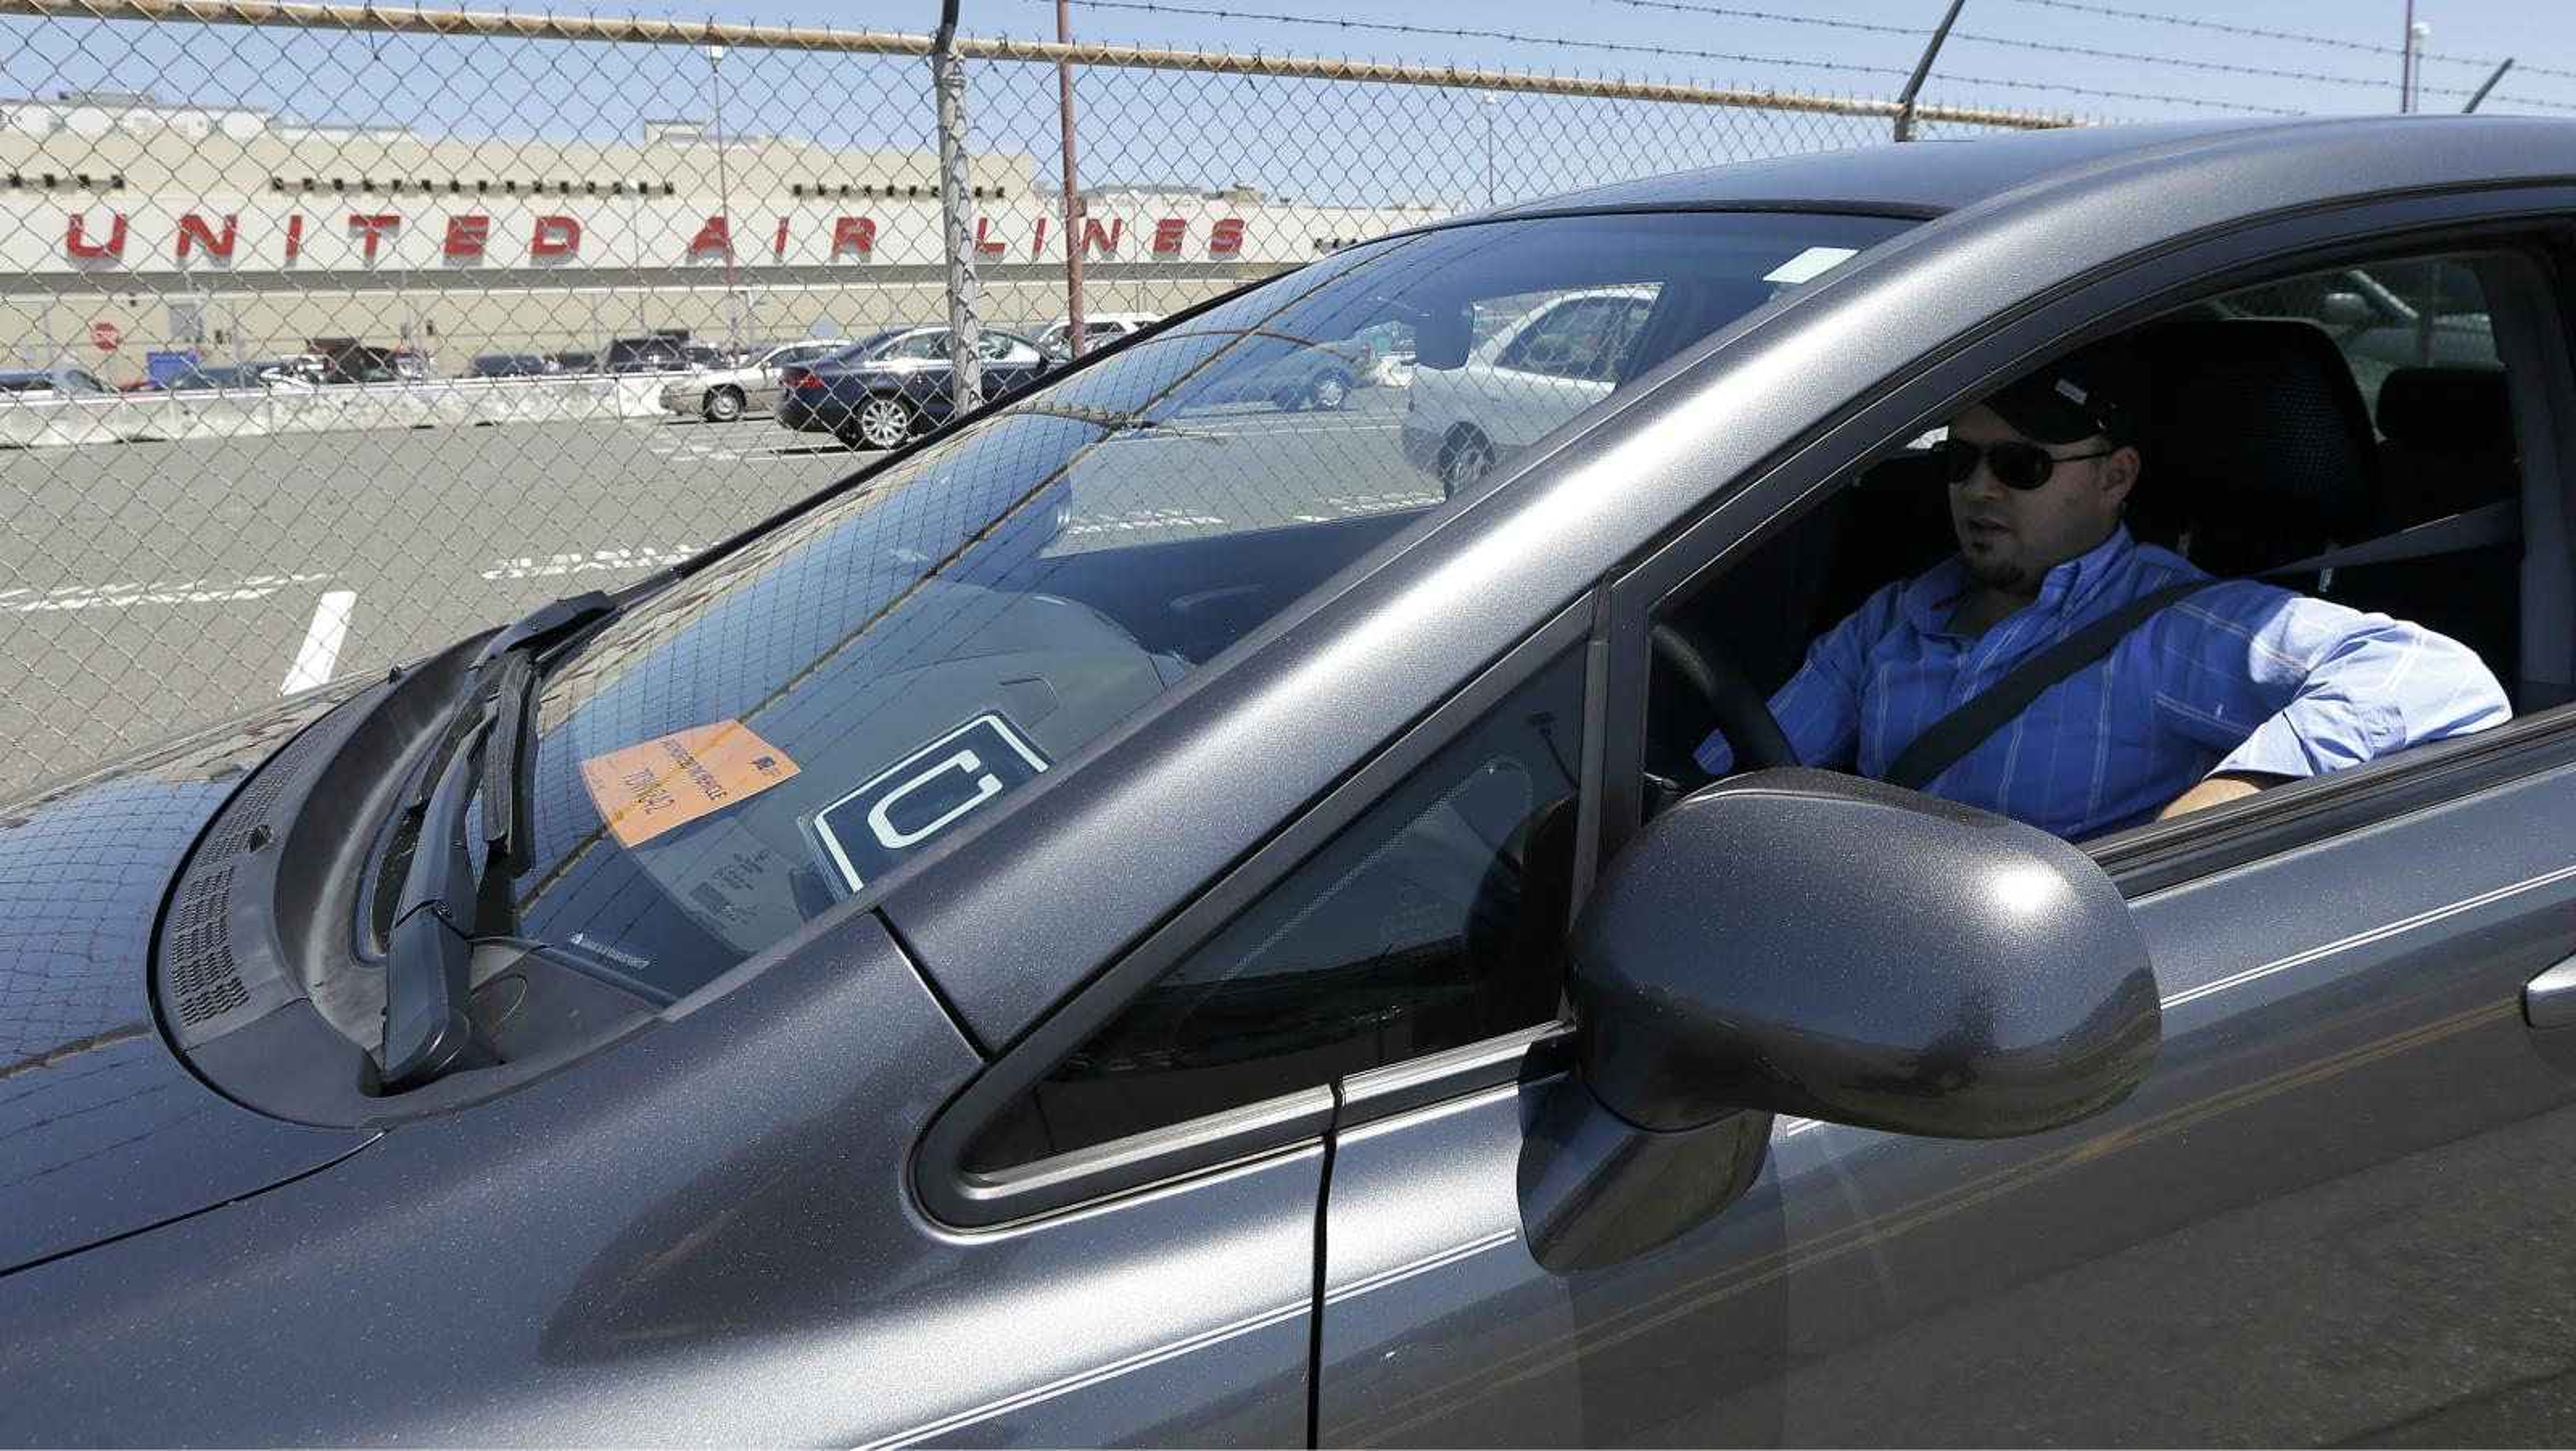 Foto De Enterprise Car S Fresno Ca Estados Unidos